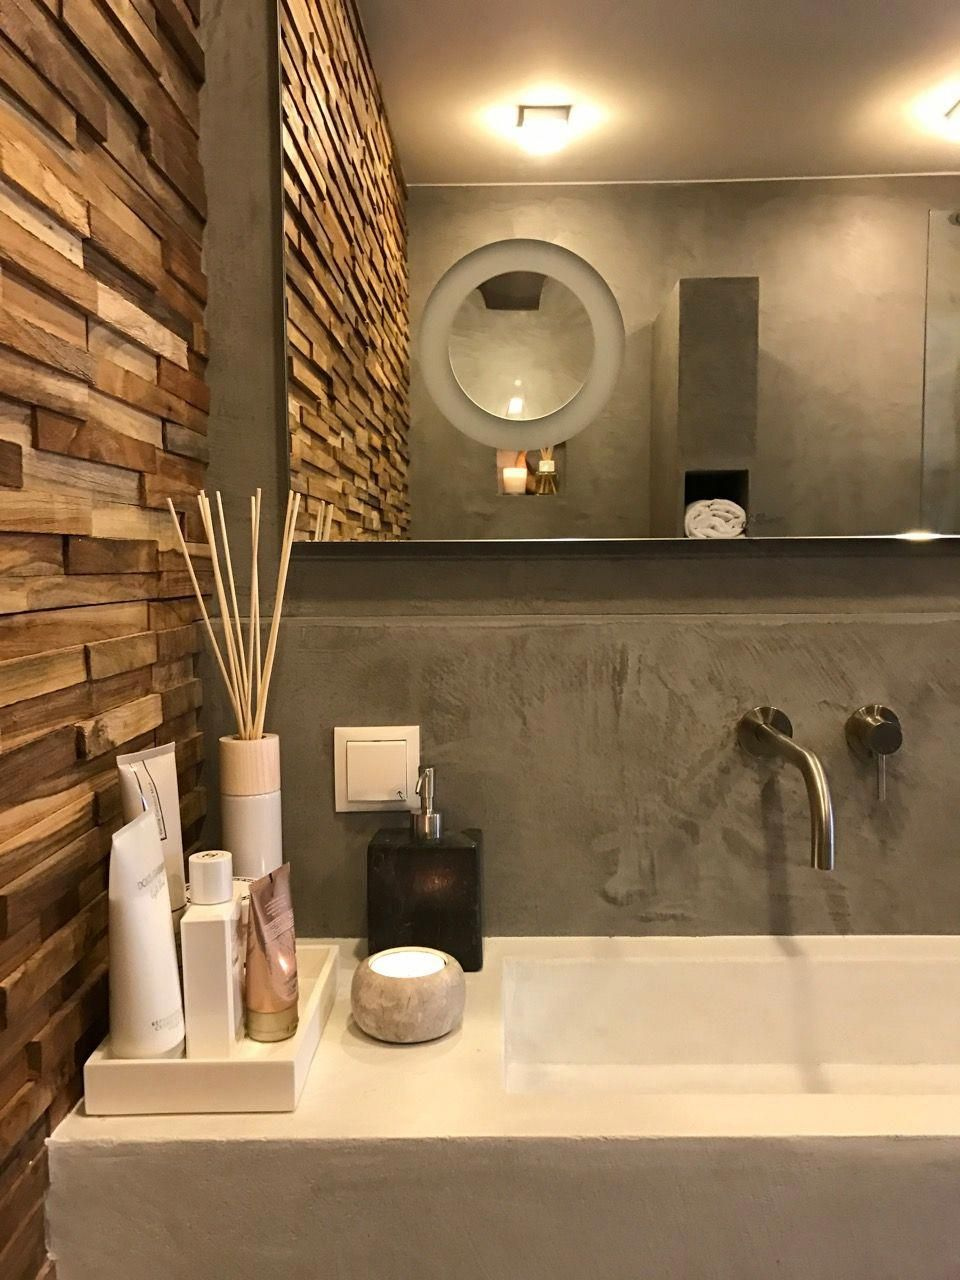 Hotel Chique Badkamer Eigen Huis Tuin Moderndesignbathrooms